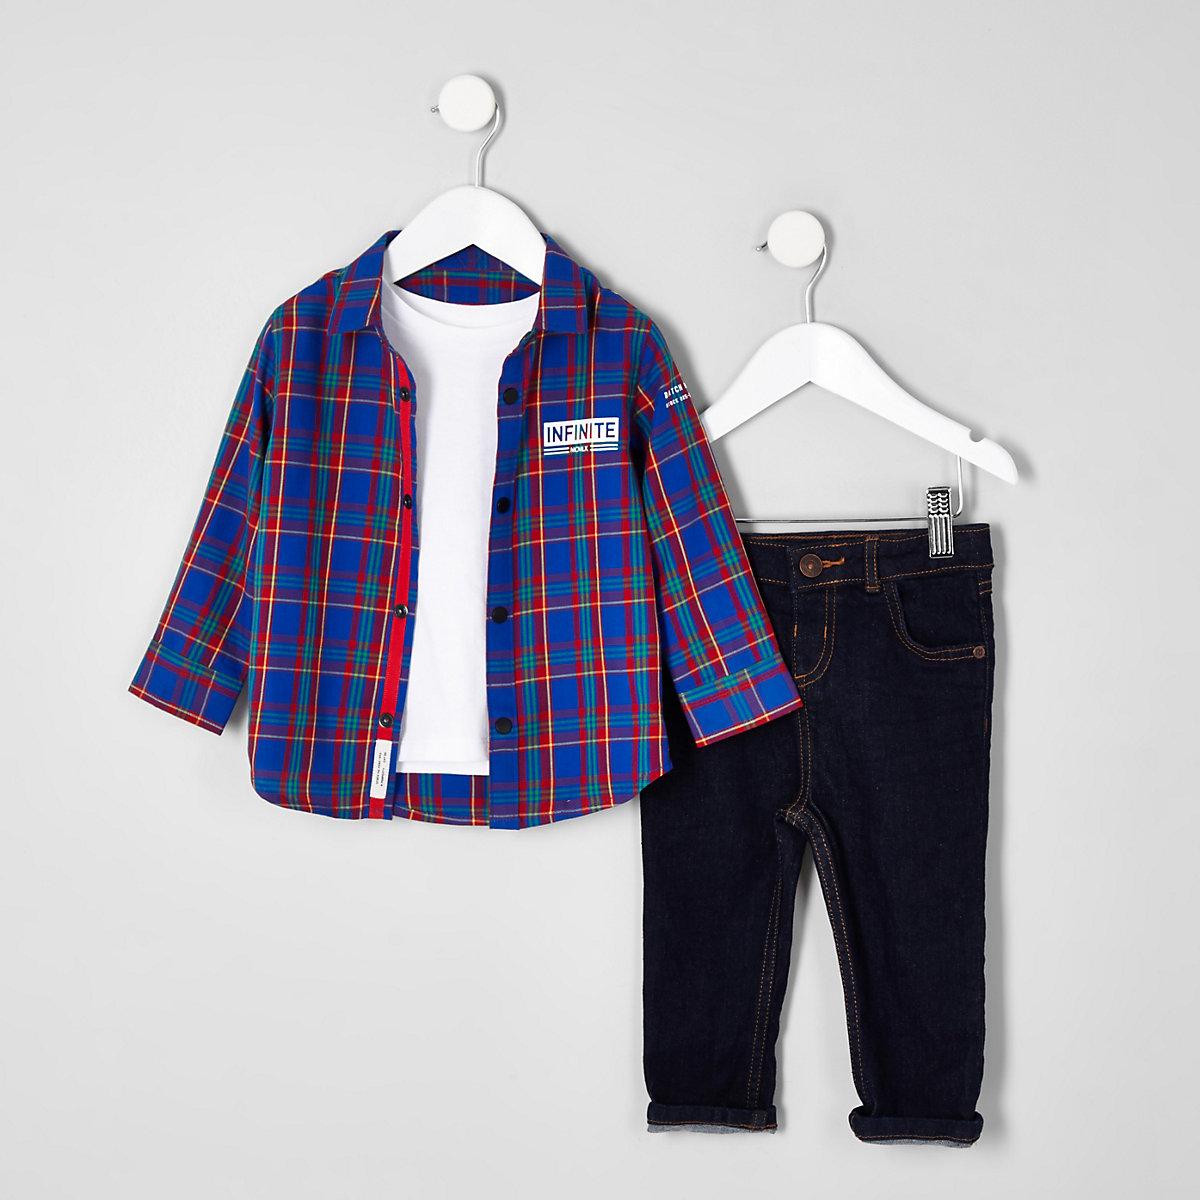 Mini boys bright blue check shirt outfit